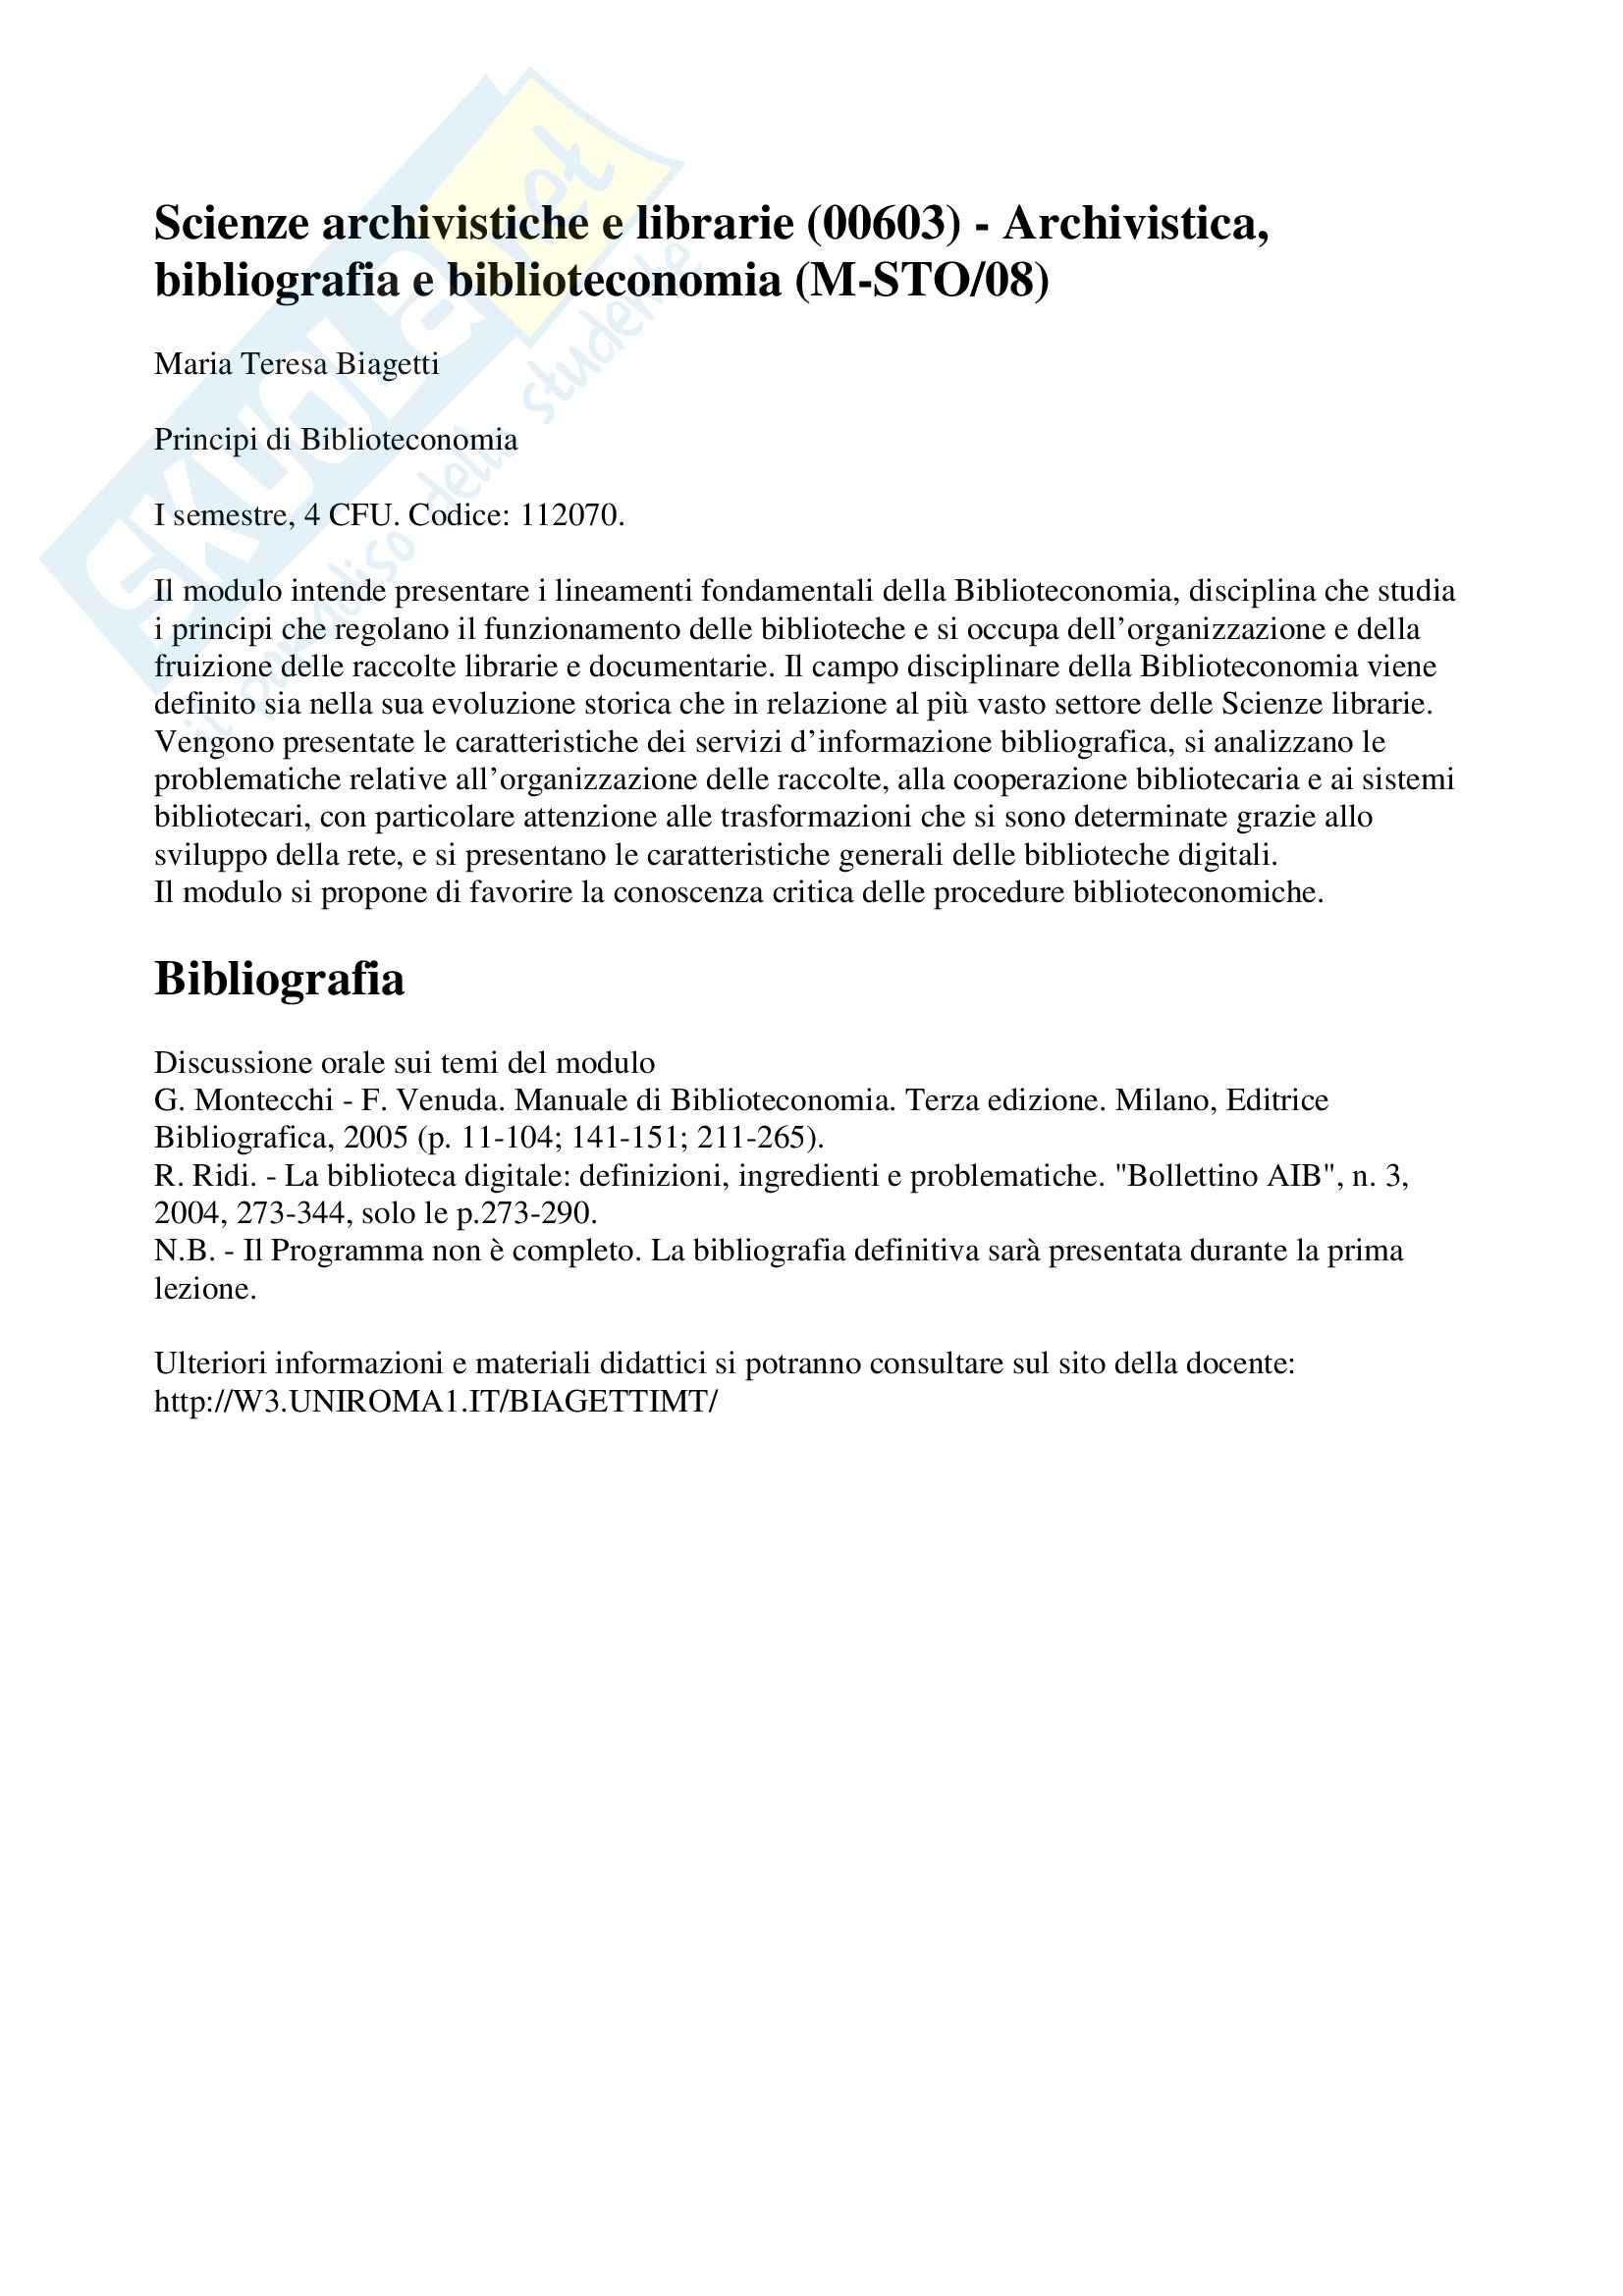 Biblioteconomia - Principi